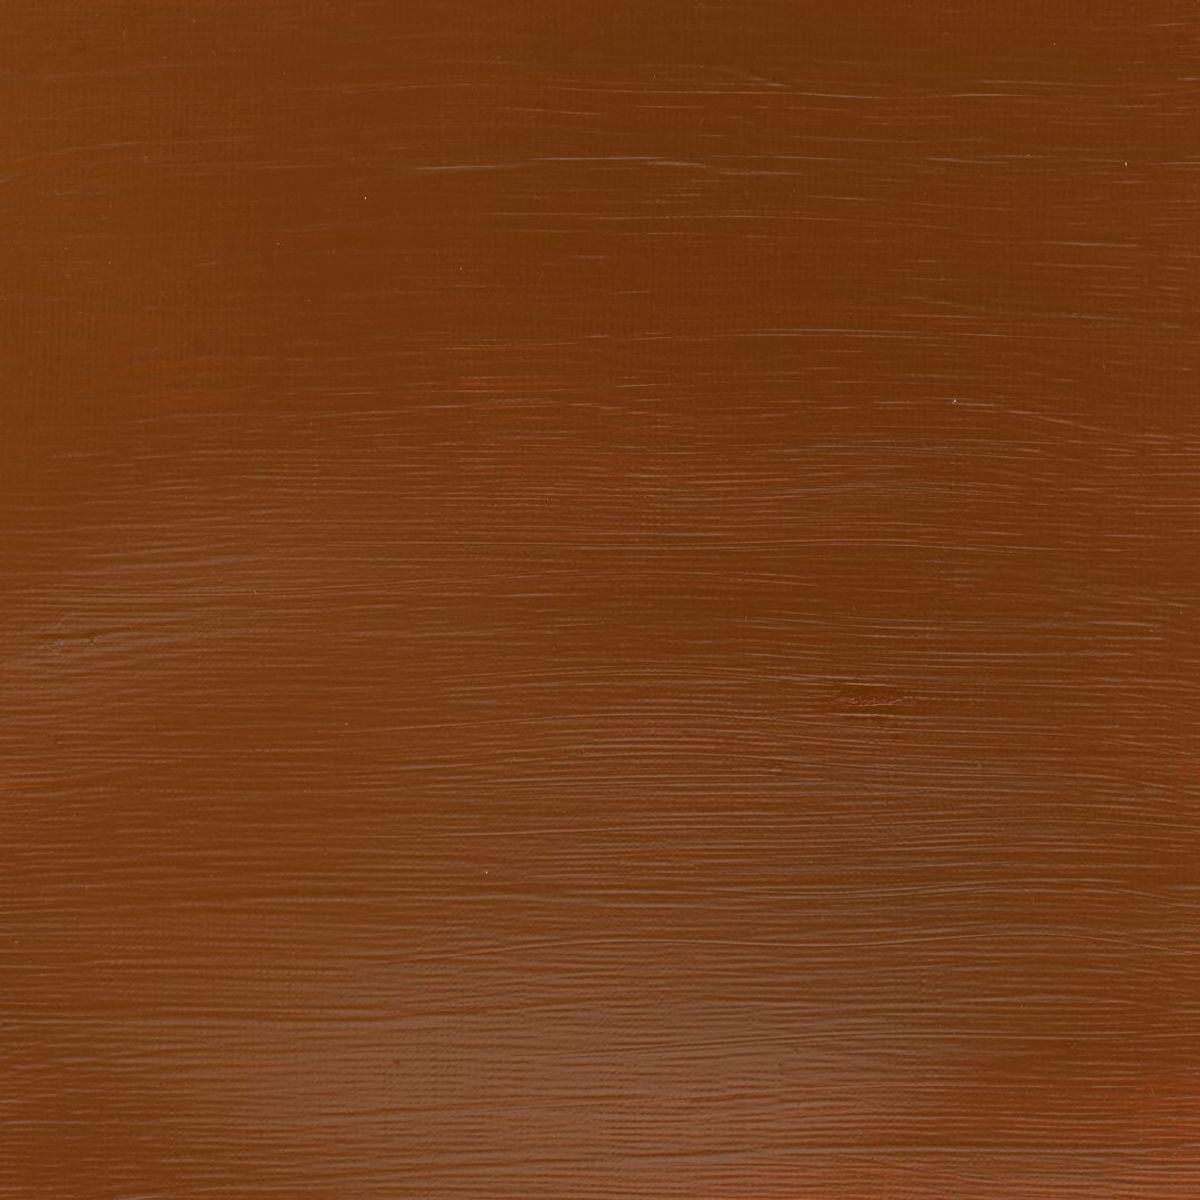 WINSOR AND NEWTON GALERIA ACRYLIC COLOUR - TUBE OF 60 ML - RAW SIENNA (552)